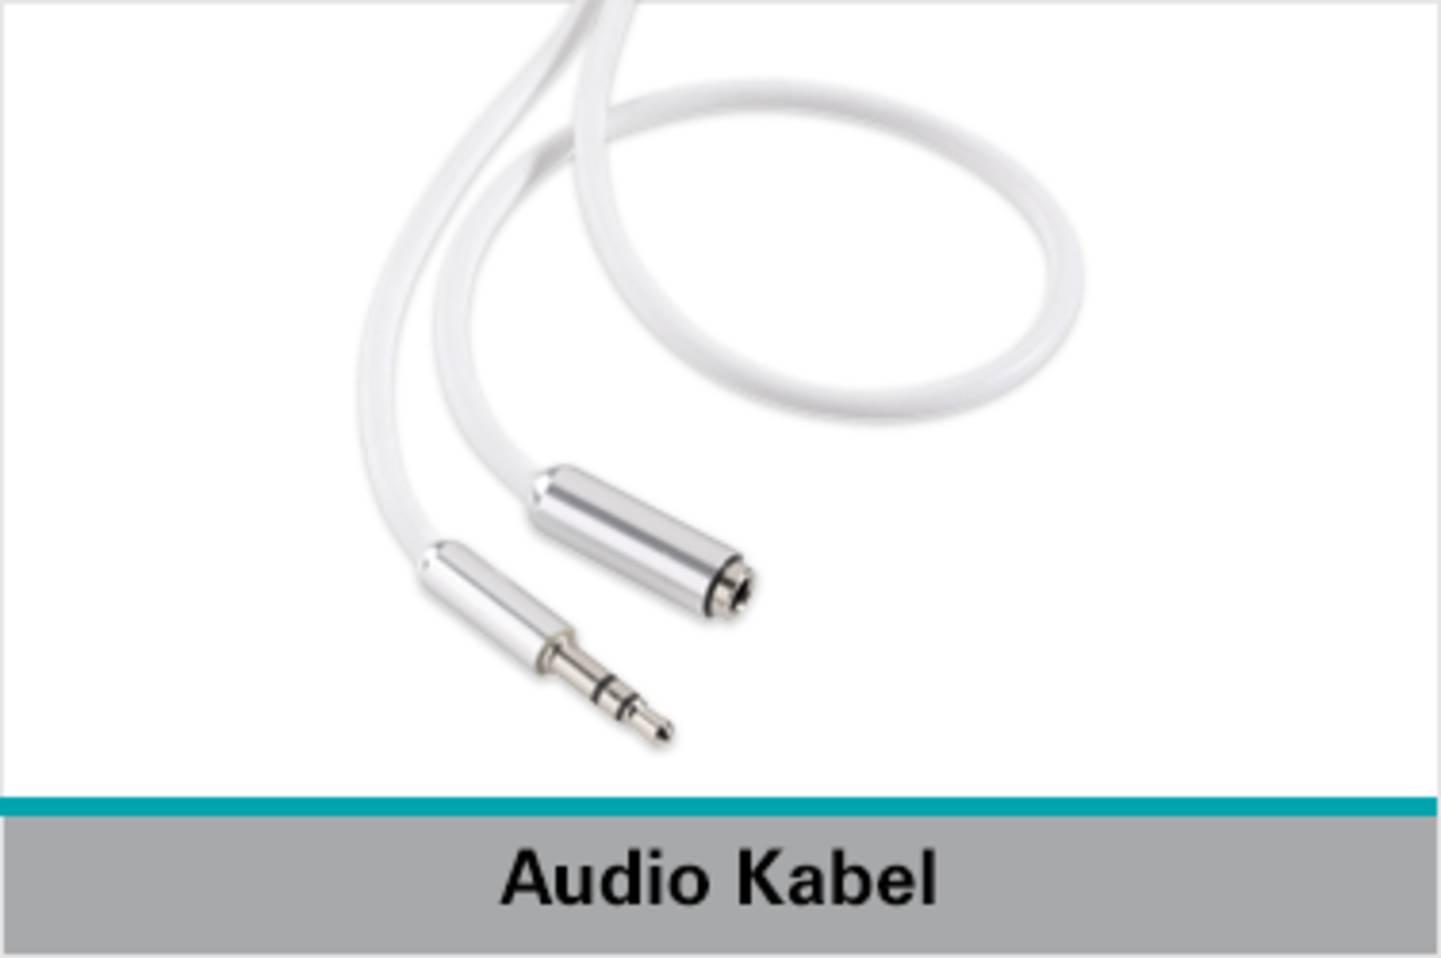 Speaka Professional Audio Kabel